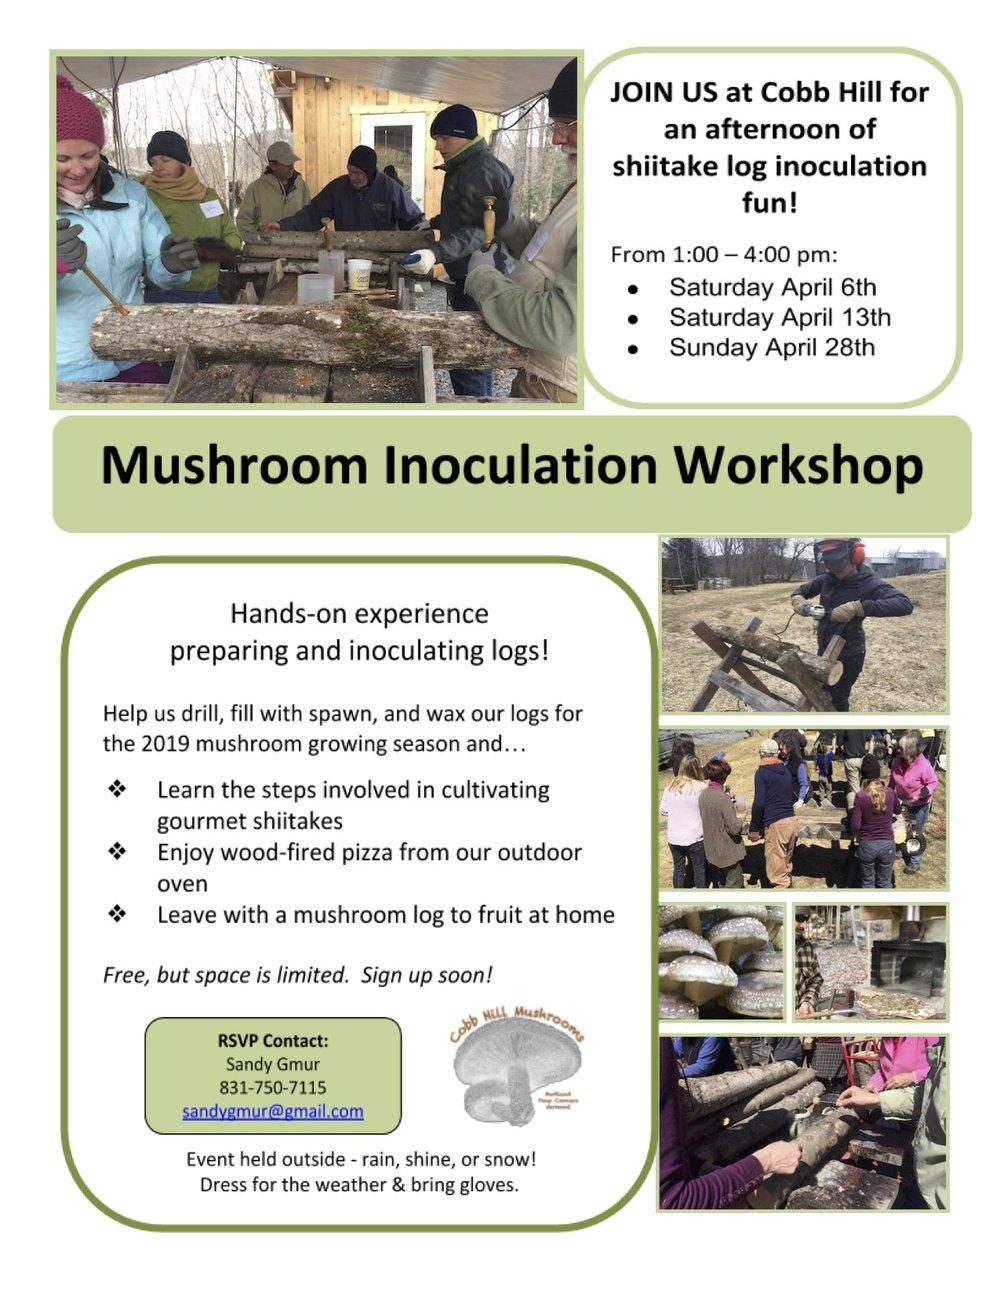 Mushroom wkshop flyer 2019.jpg